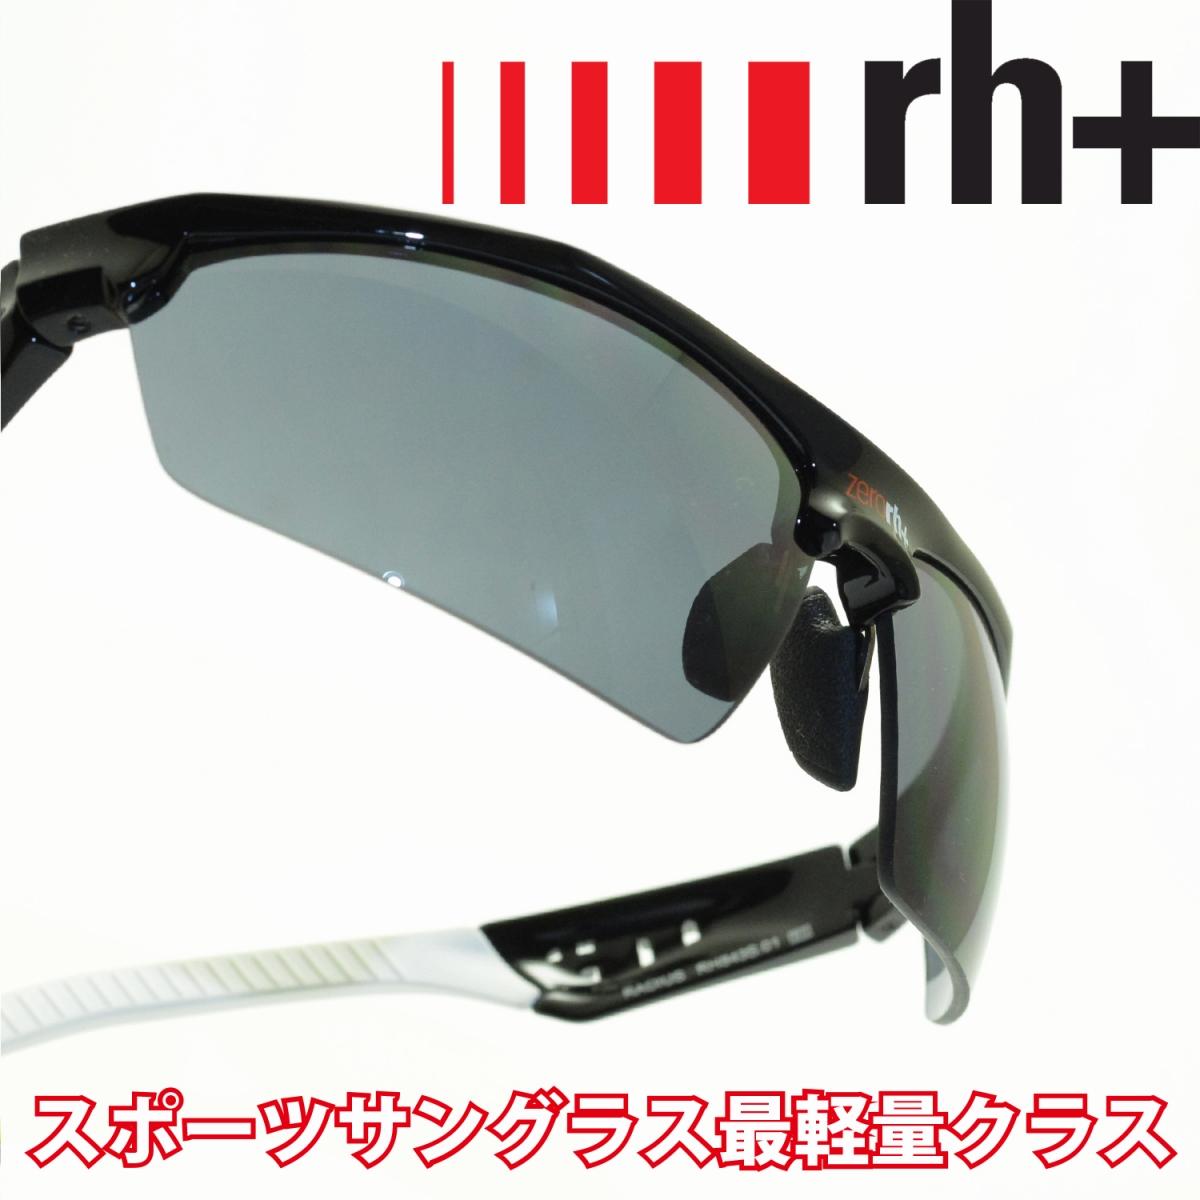 rh+ アールエイチプラス RADIUS RH843S01メガネ 眼鏡 めがね メンズ レディース おしゃれ ブランド 人気 おすすめ フレーム 流行り 度付き レンズ サングラス スポーツ